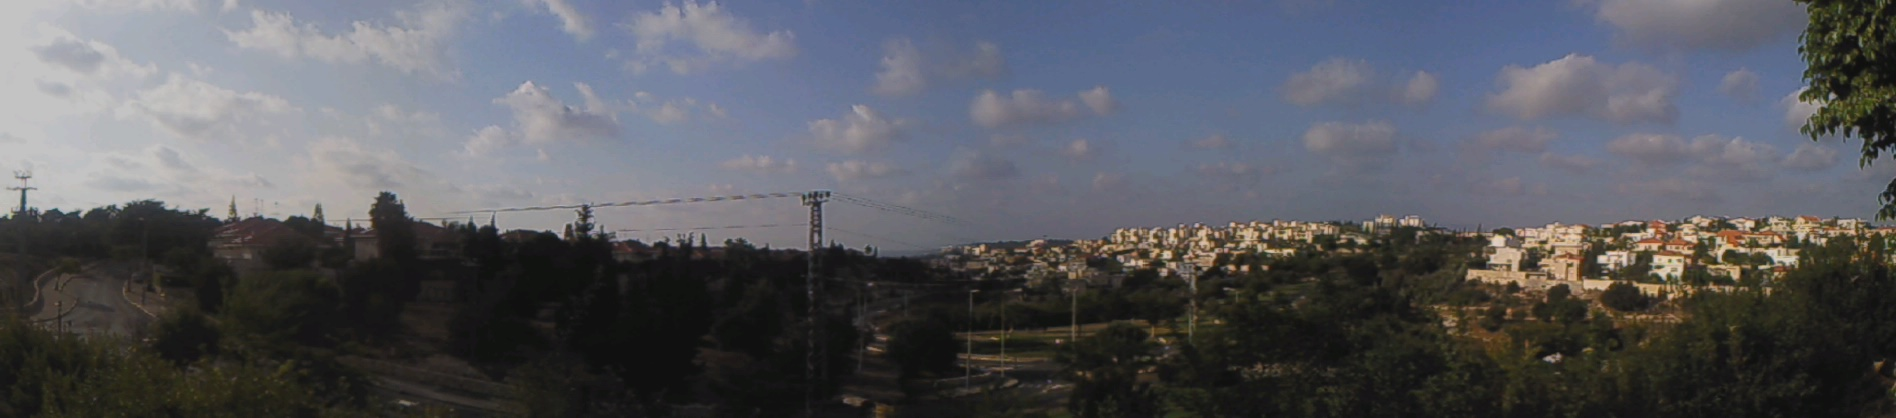 Givat-RamTal-KiryatAta